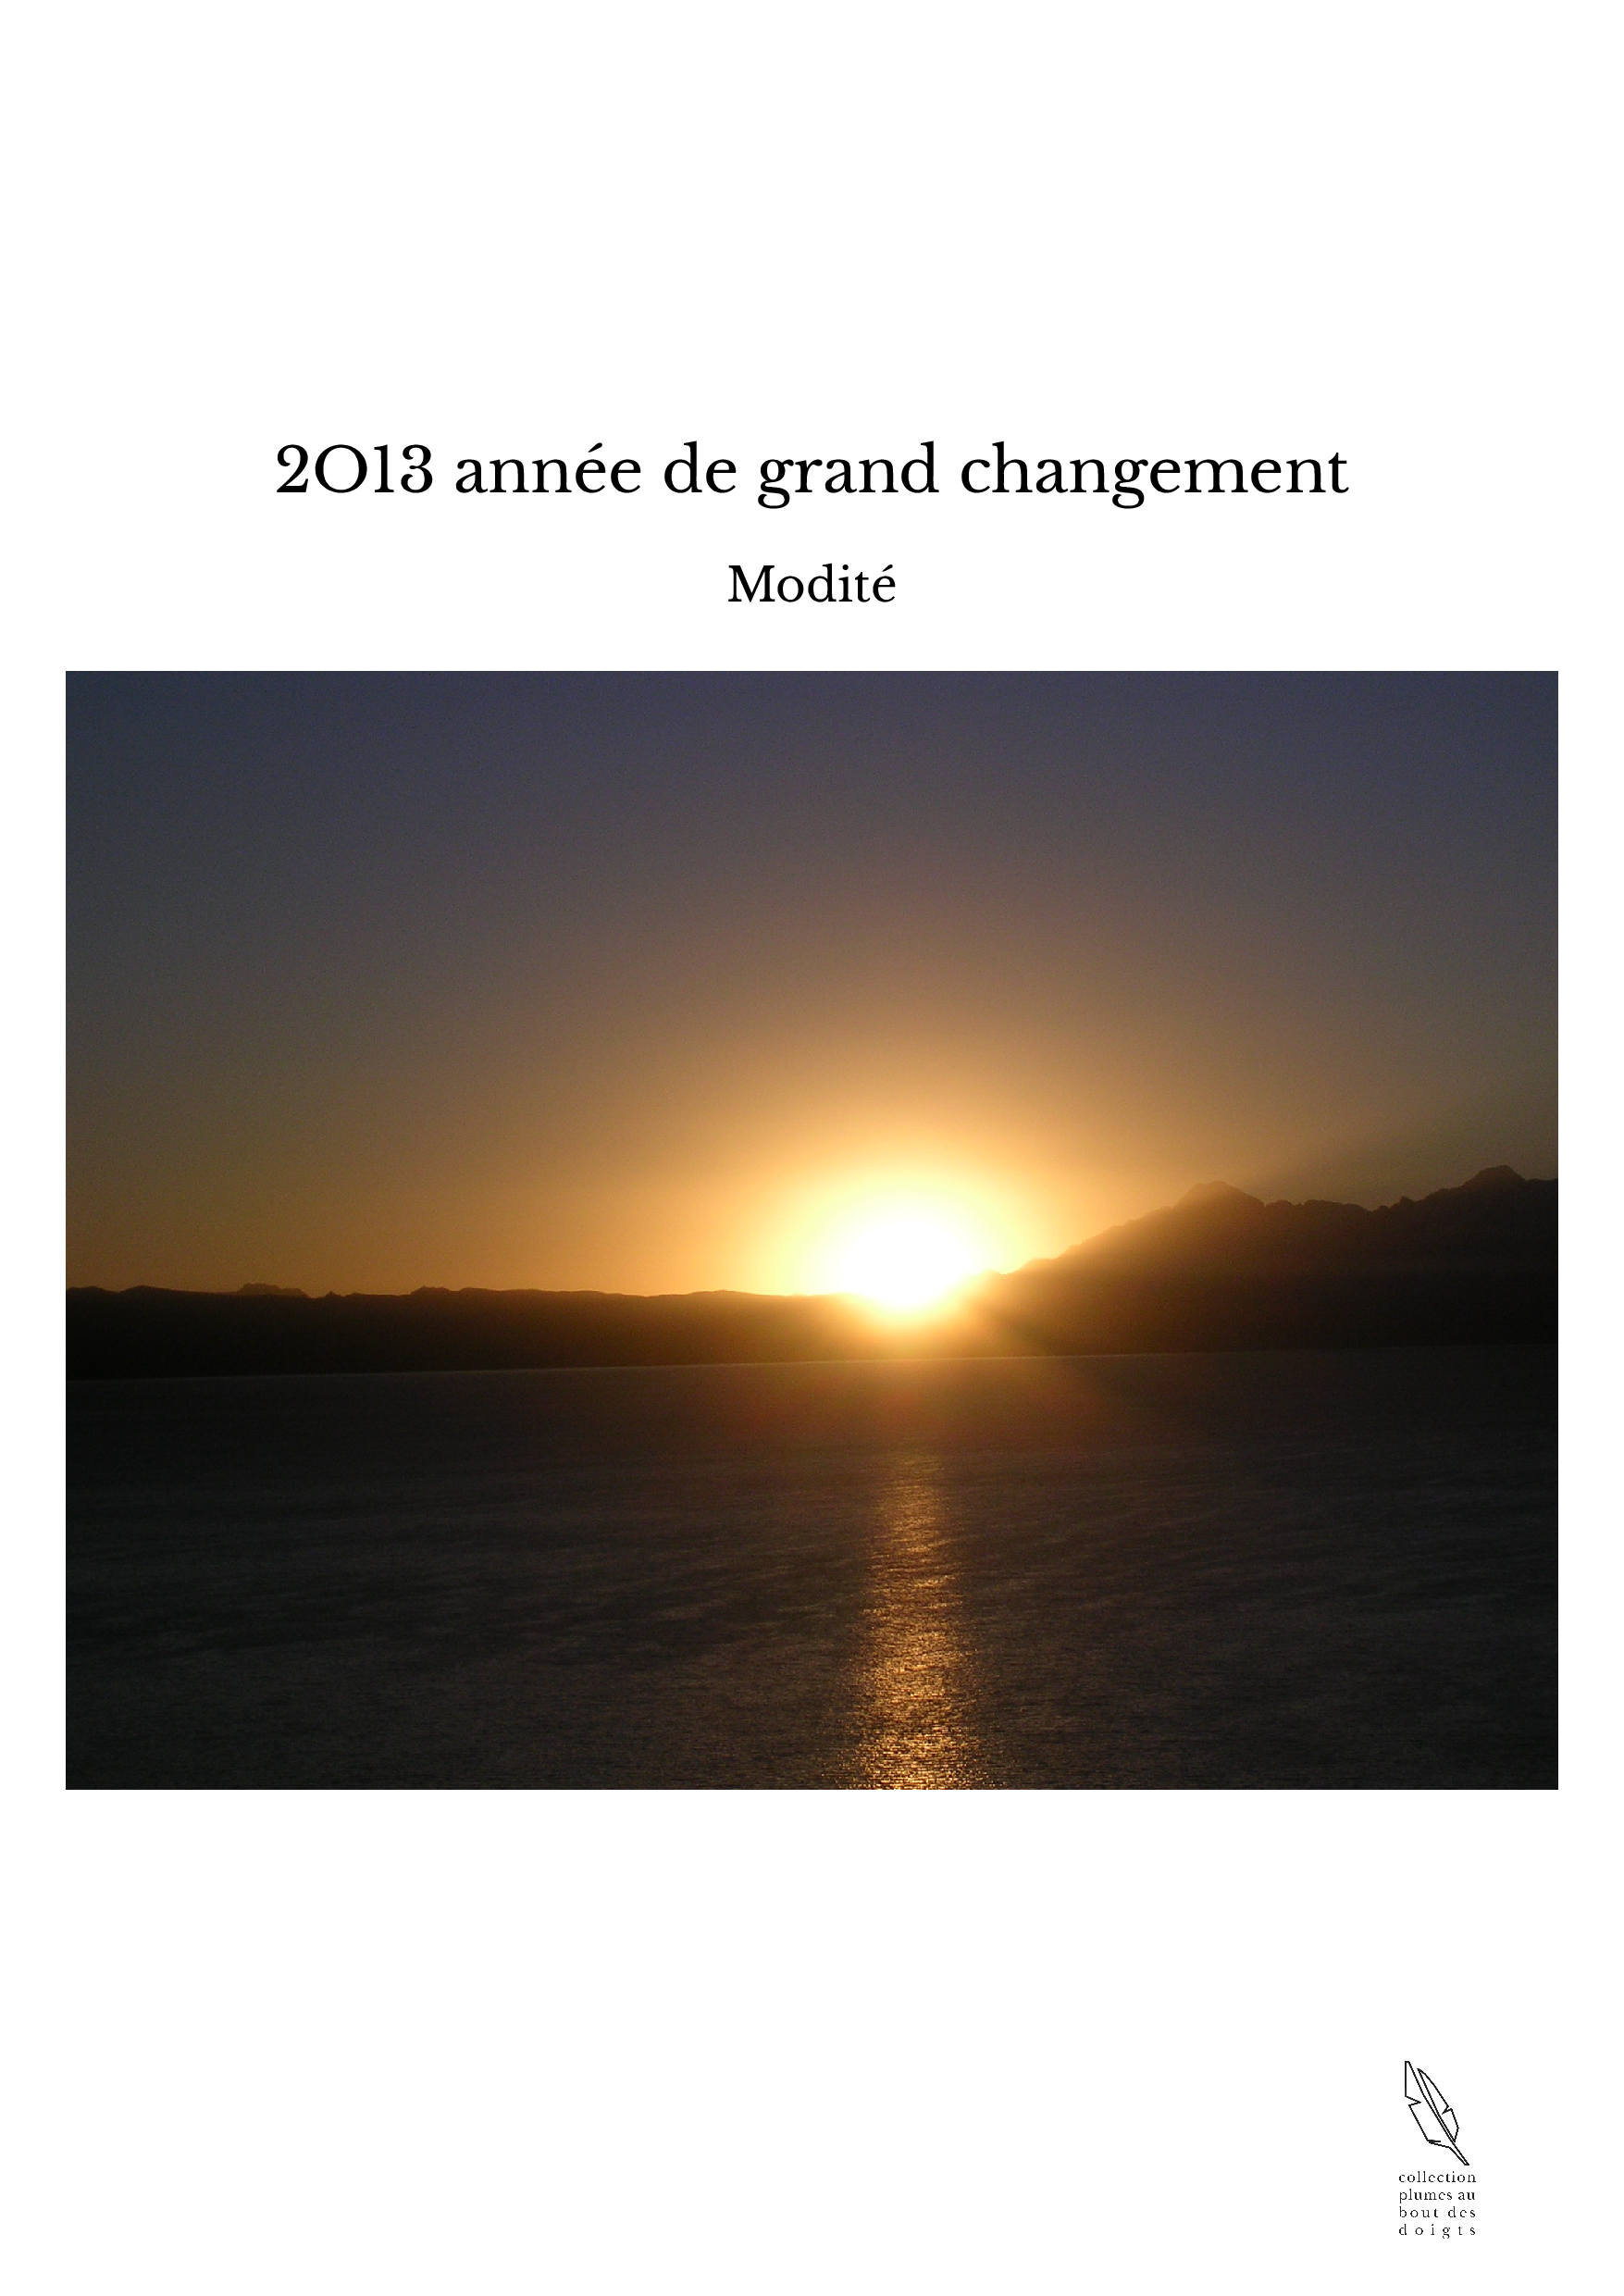 2O13 année de grand changement